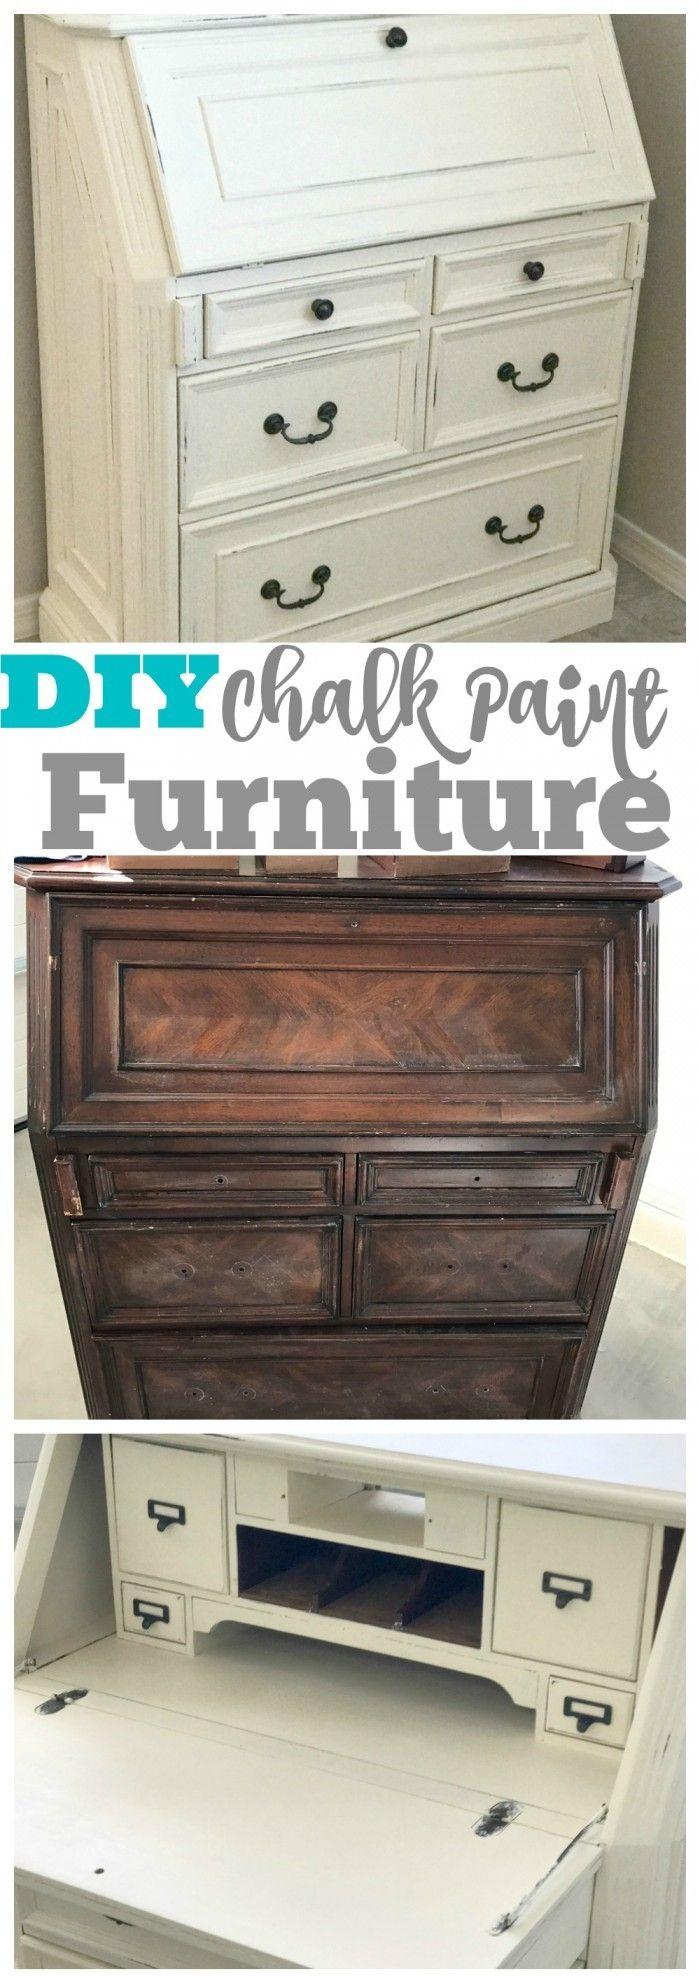 best 25 chalk paint tutorial ideas on pinterest chalk paint furniture chalk paint dresser. Black Bedroom Furniture Sets. Home Design Ideas